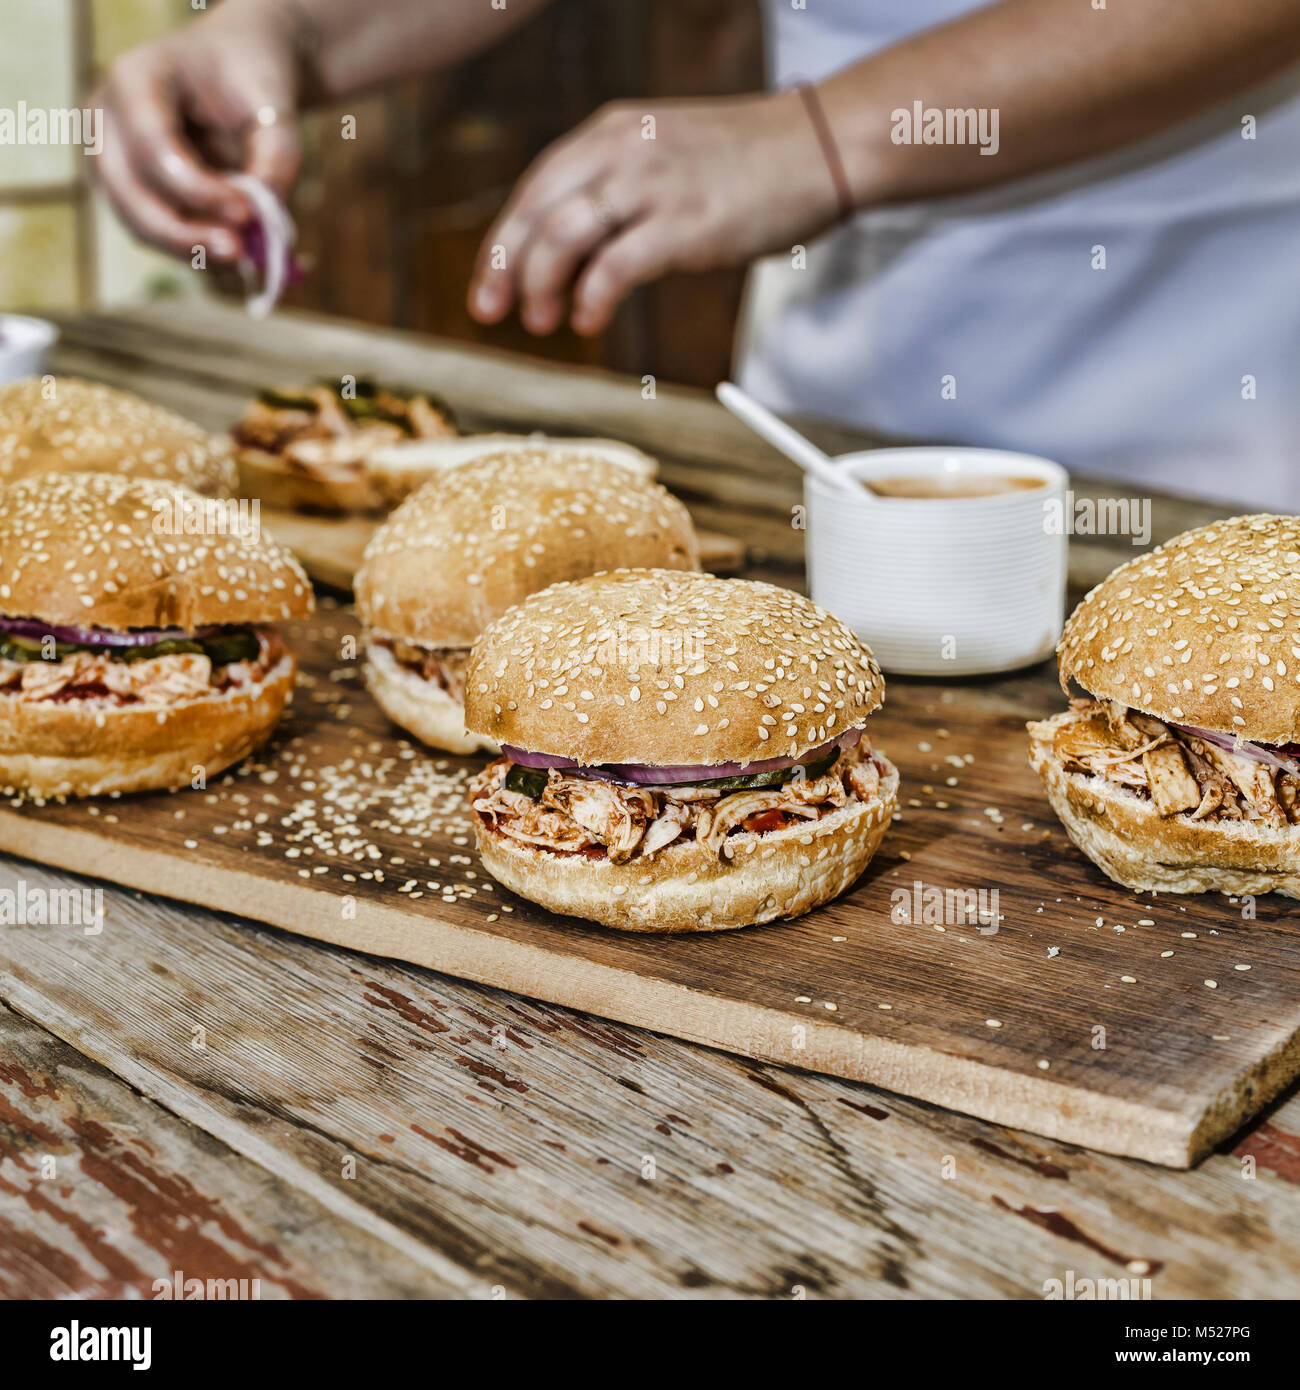 Cucina casalinga. Una donna è la cottura di hamburger Immagini Stock